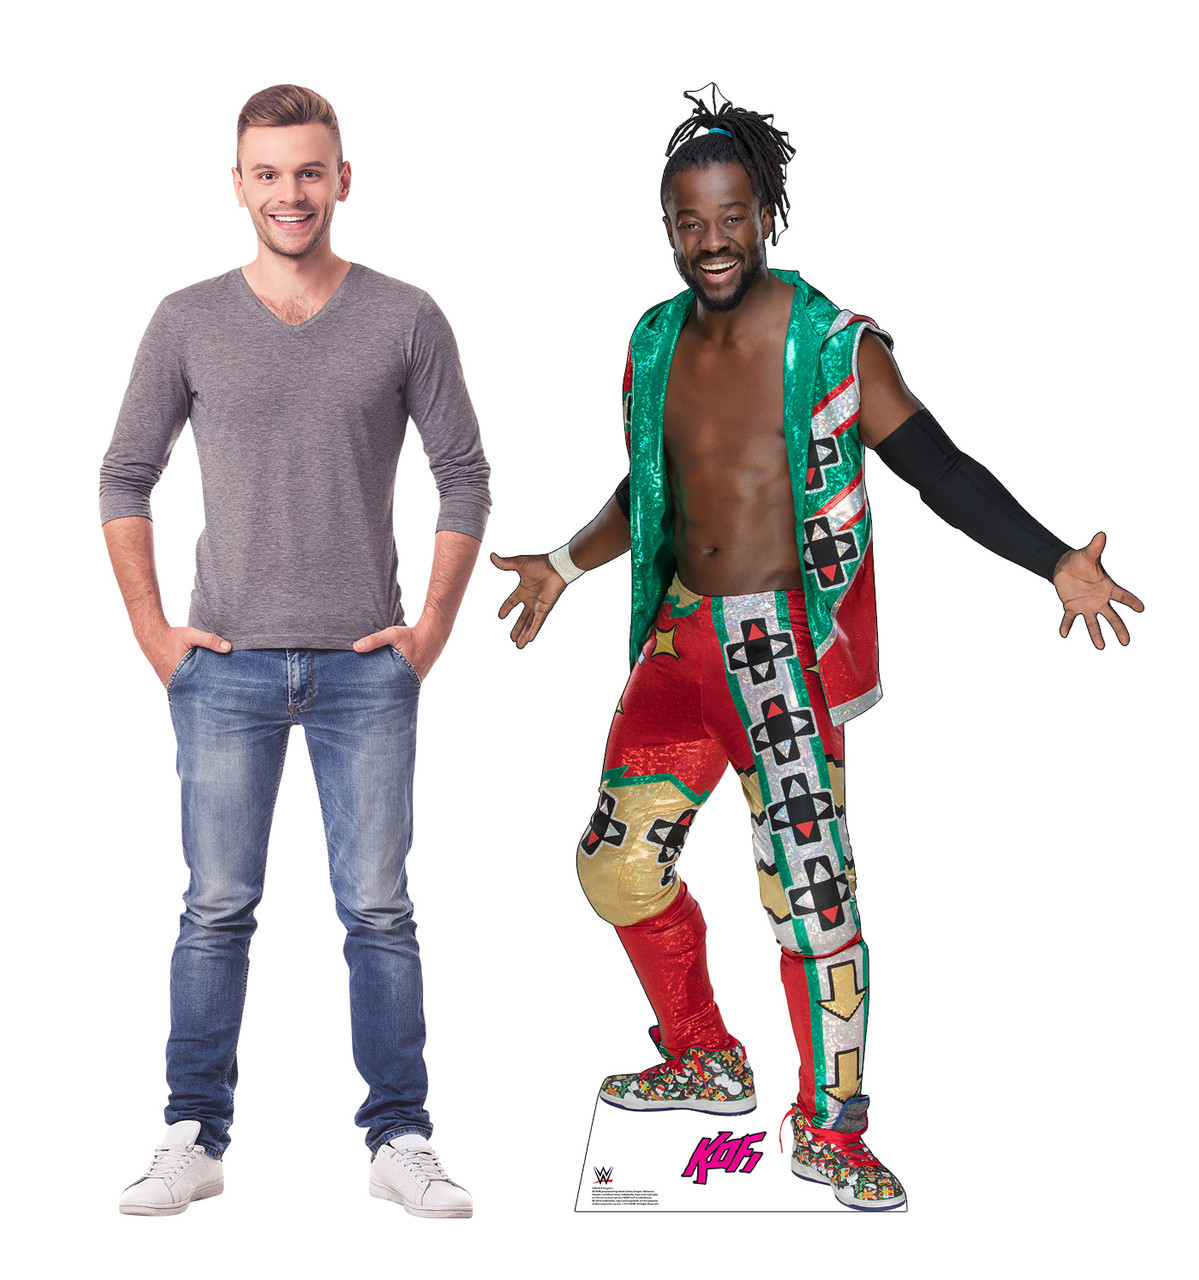 Kofi Kingston WWE - Green Vest Cardboard Cutout Lifesize